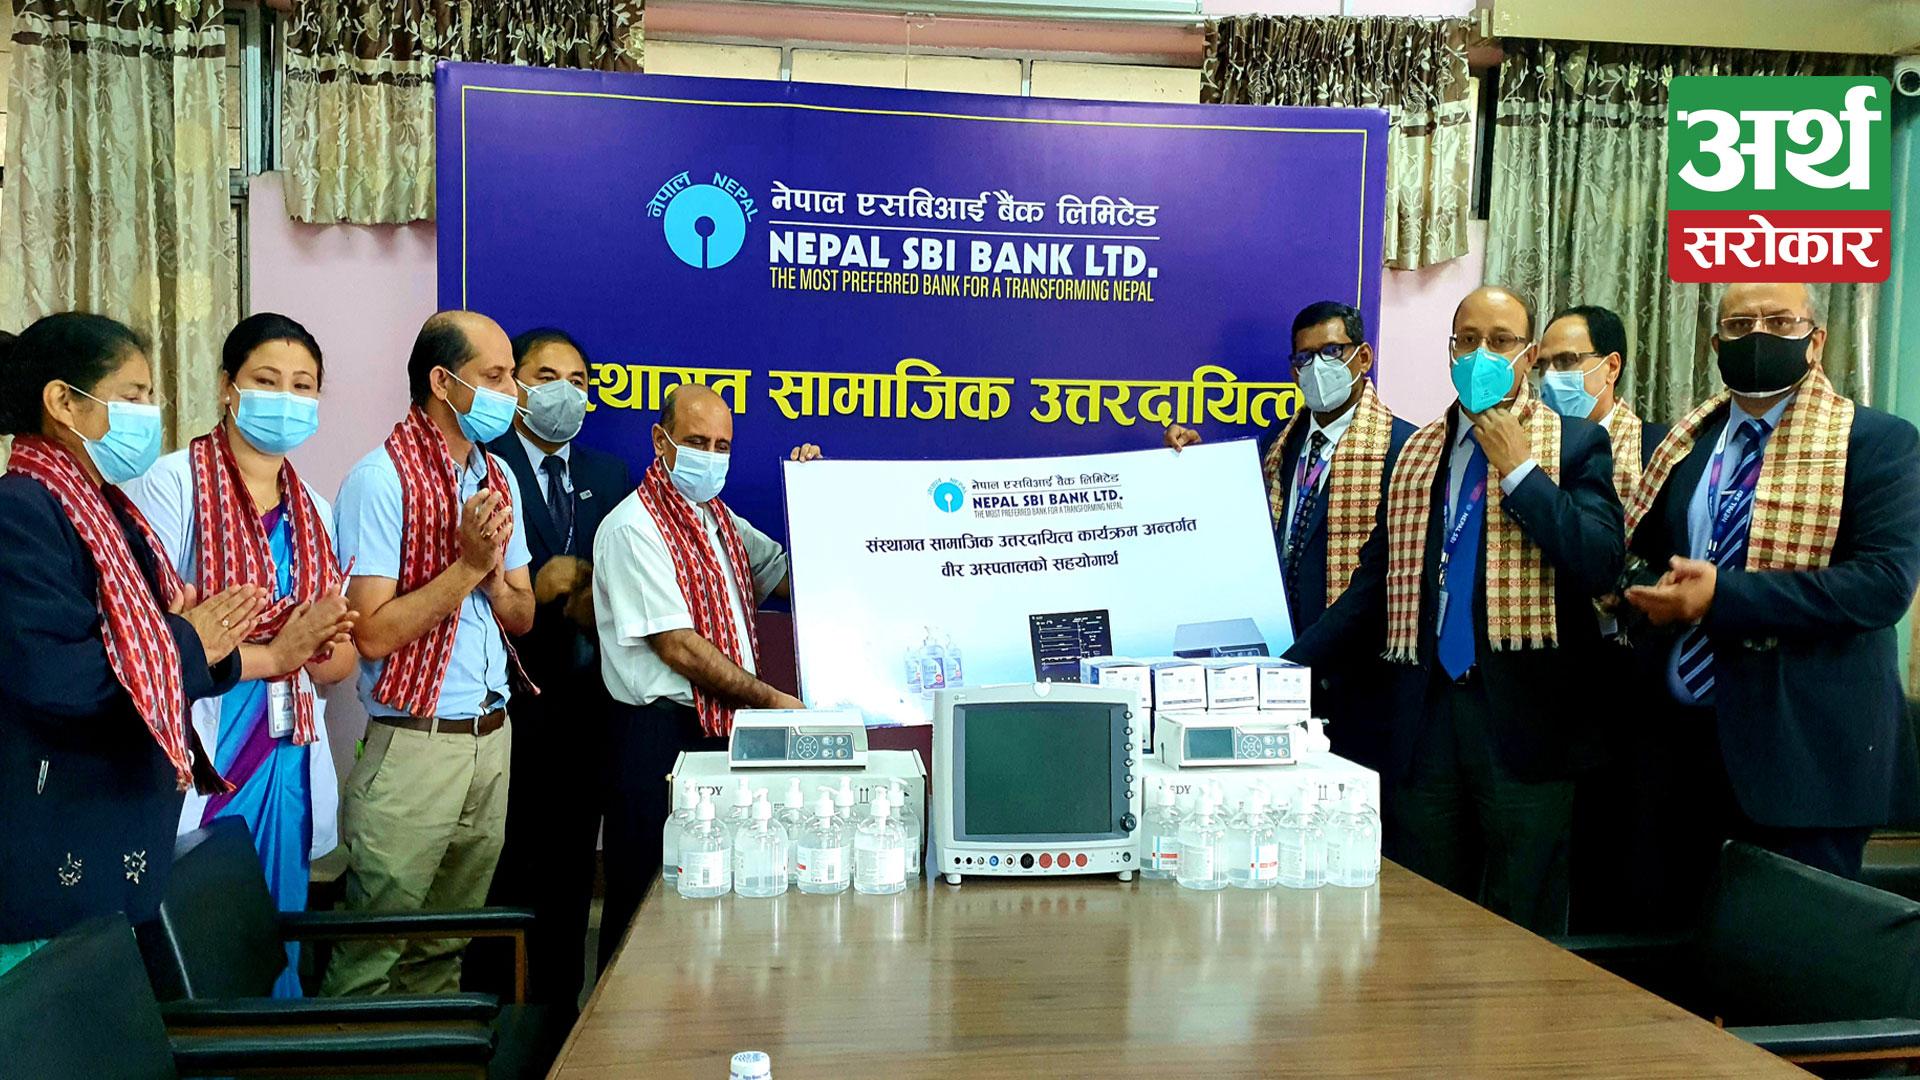 Nepal SBI Bank Ltd. celebrated its 28th Anniversary